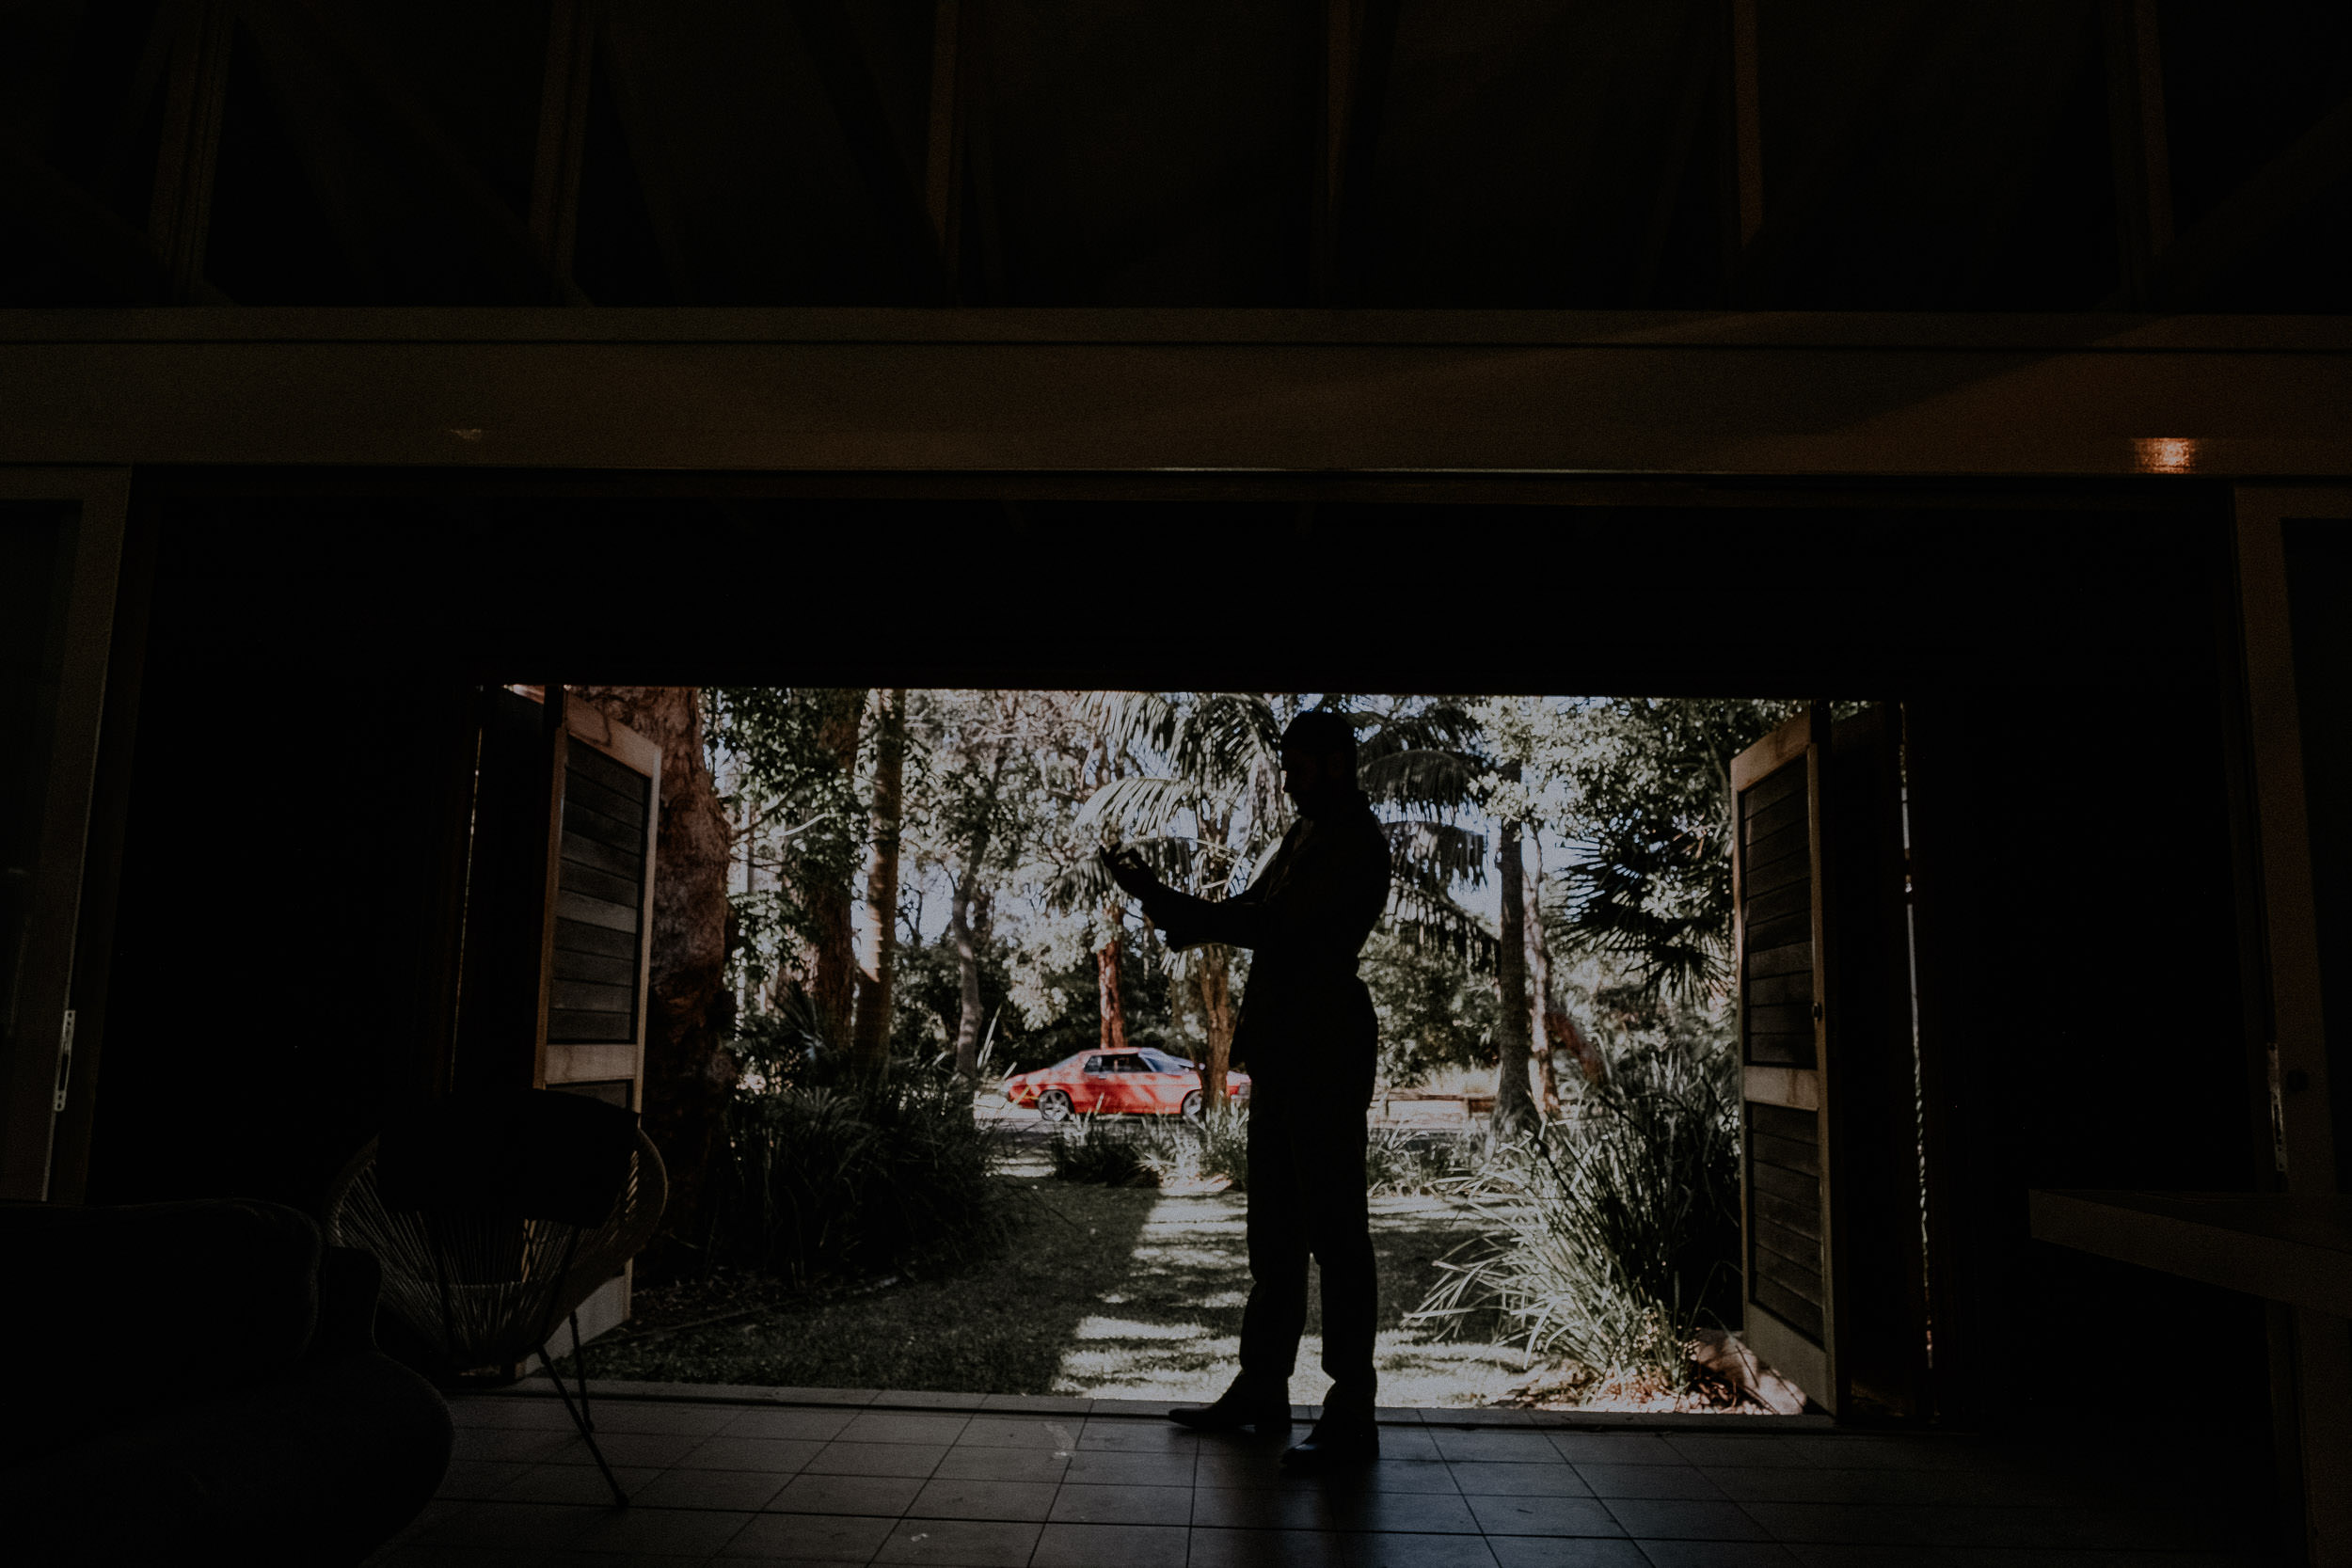 S&A Elopement - Kings & Thieves - Shred 'Til Dead - Central Coast Beach Forest Wedding - 15.jpg